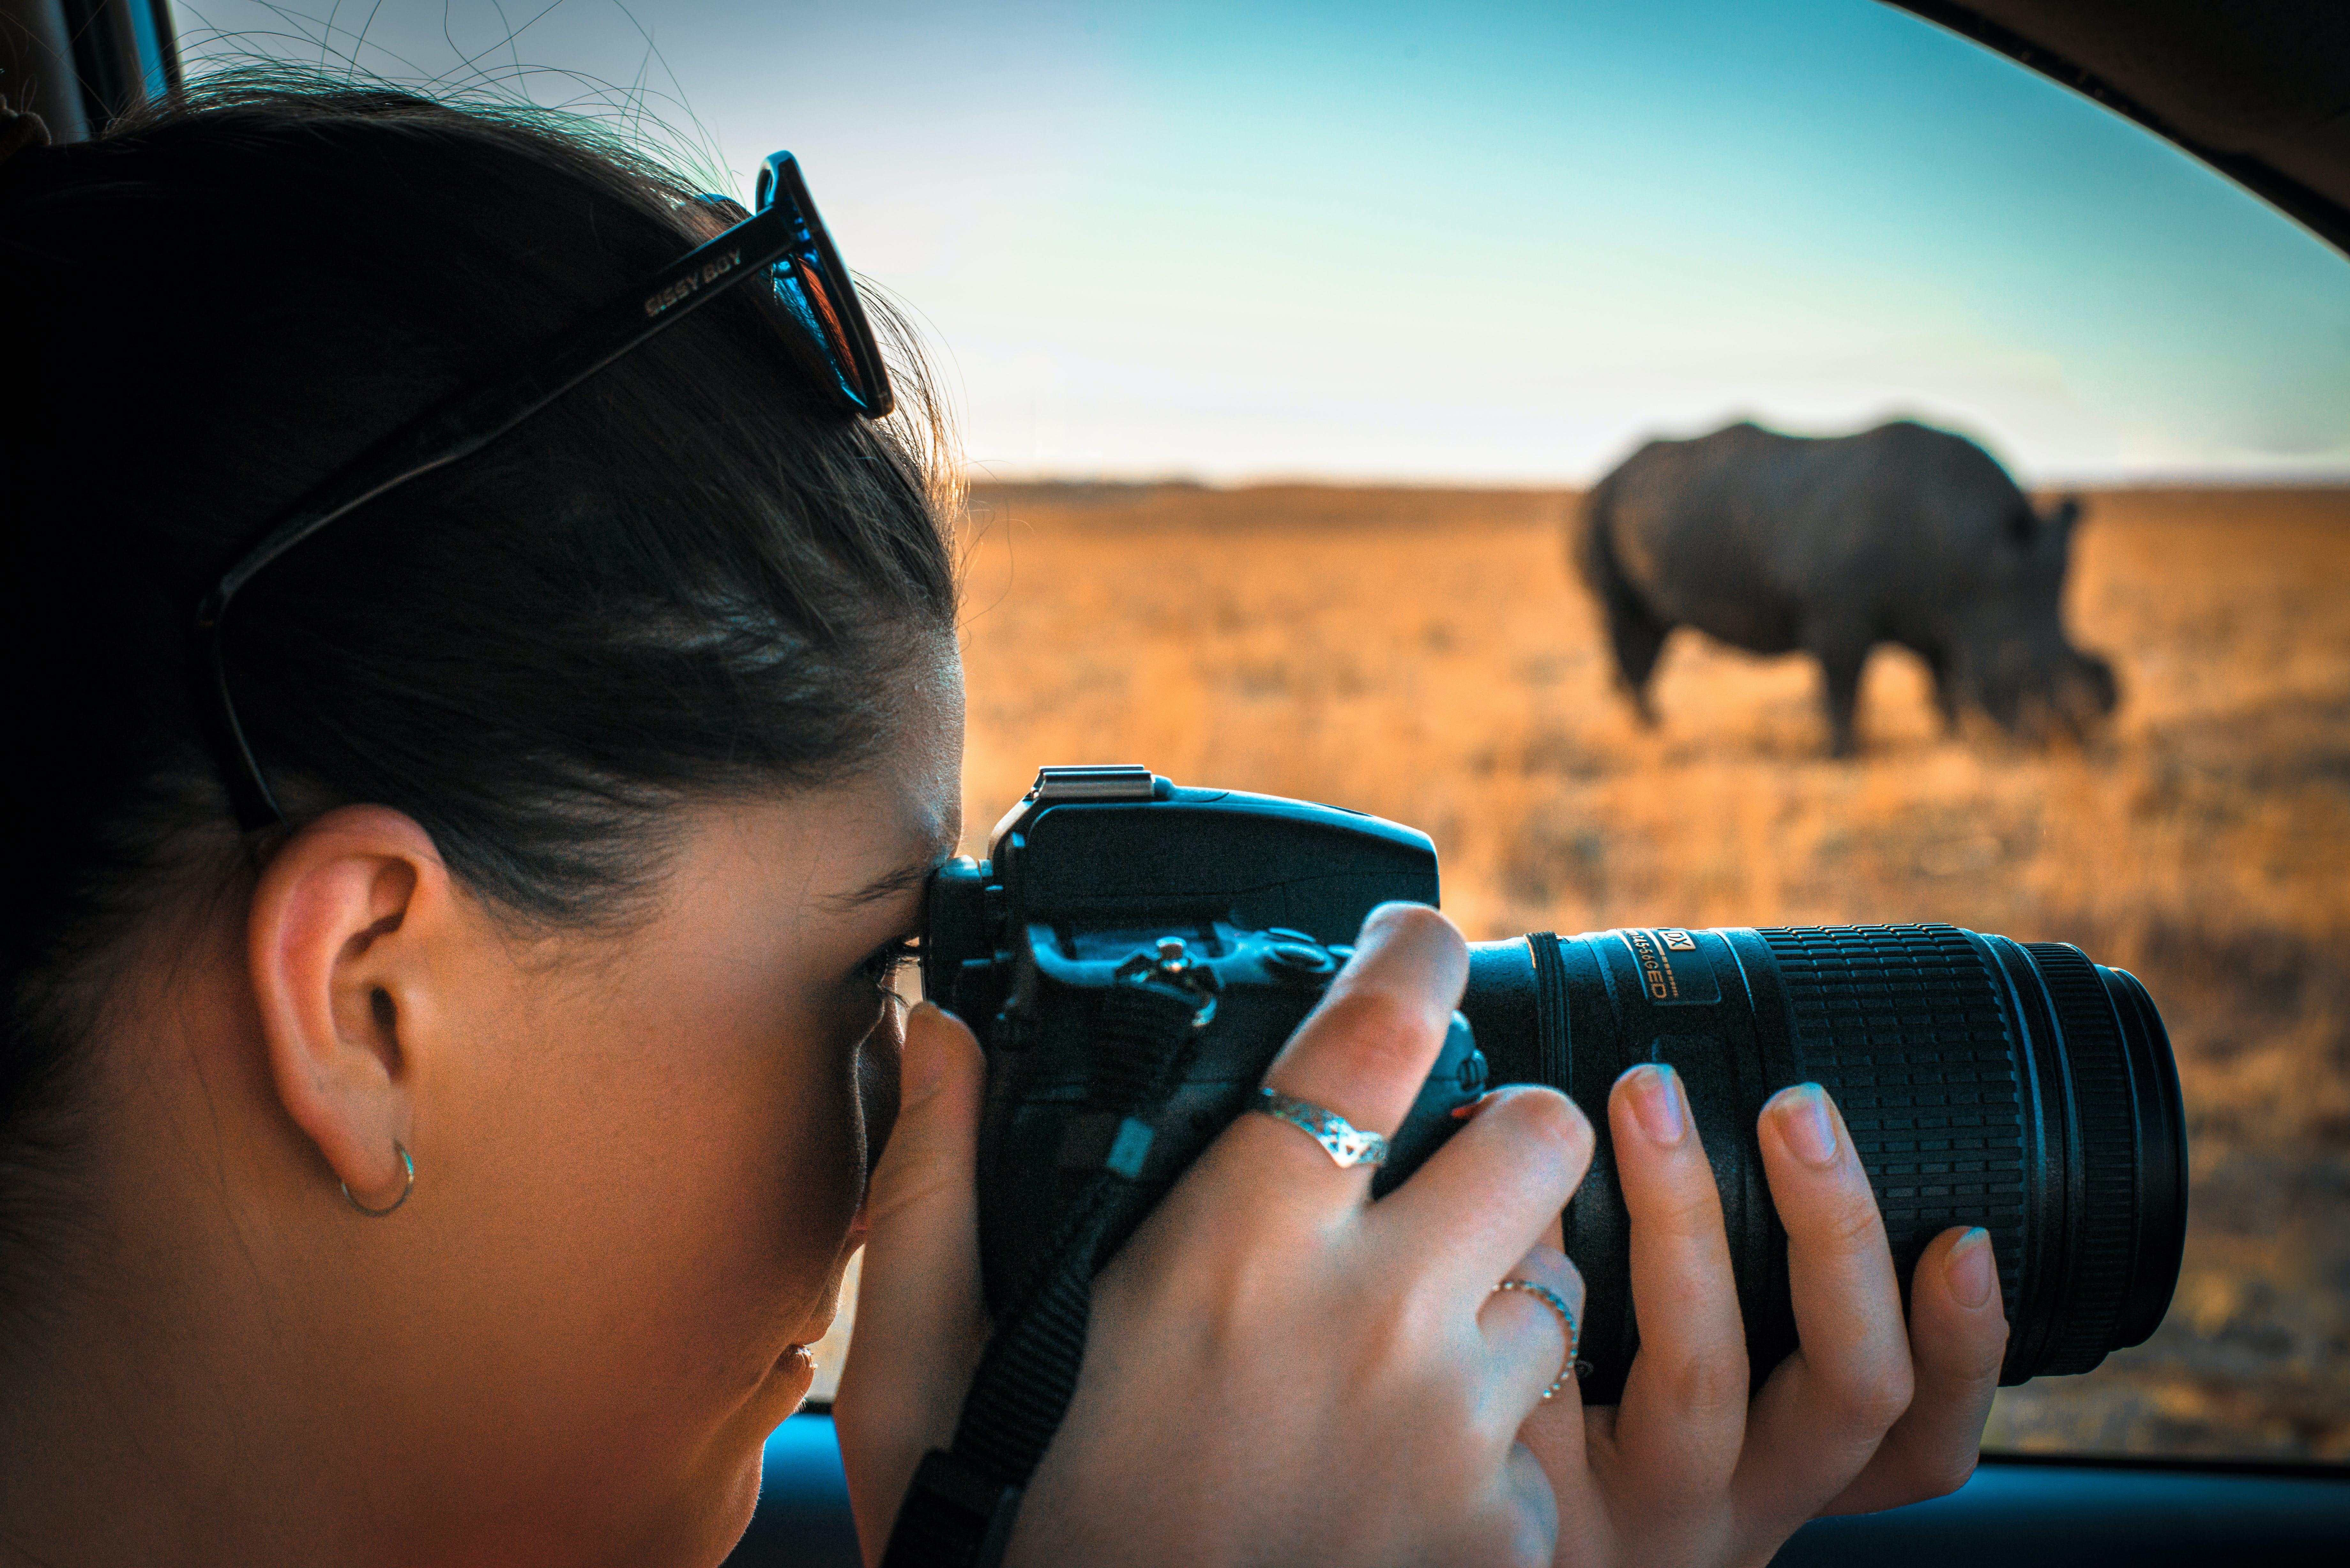 Woman Holding Black Dslr Camera